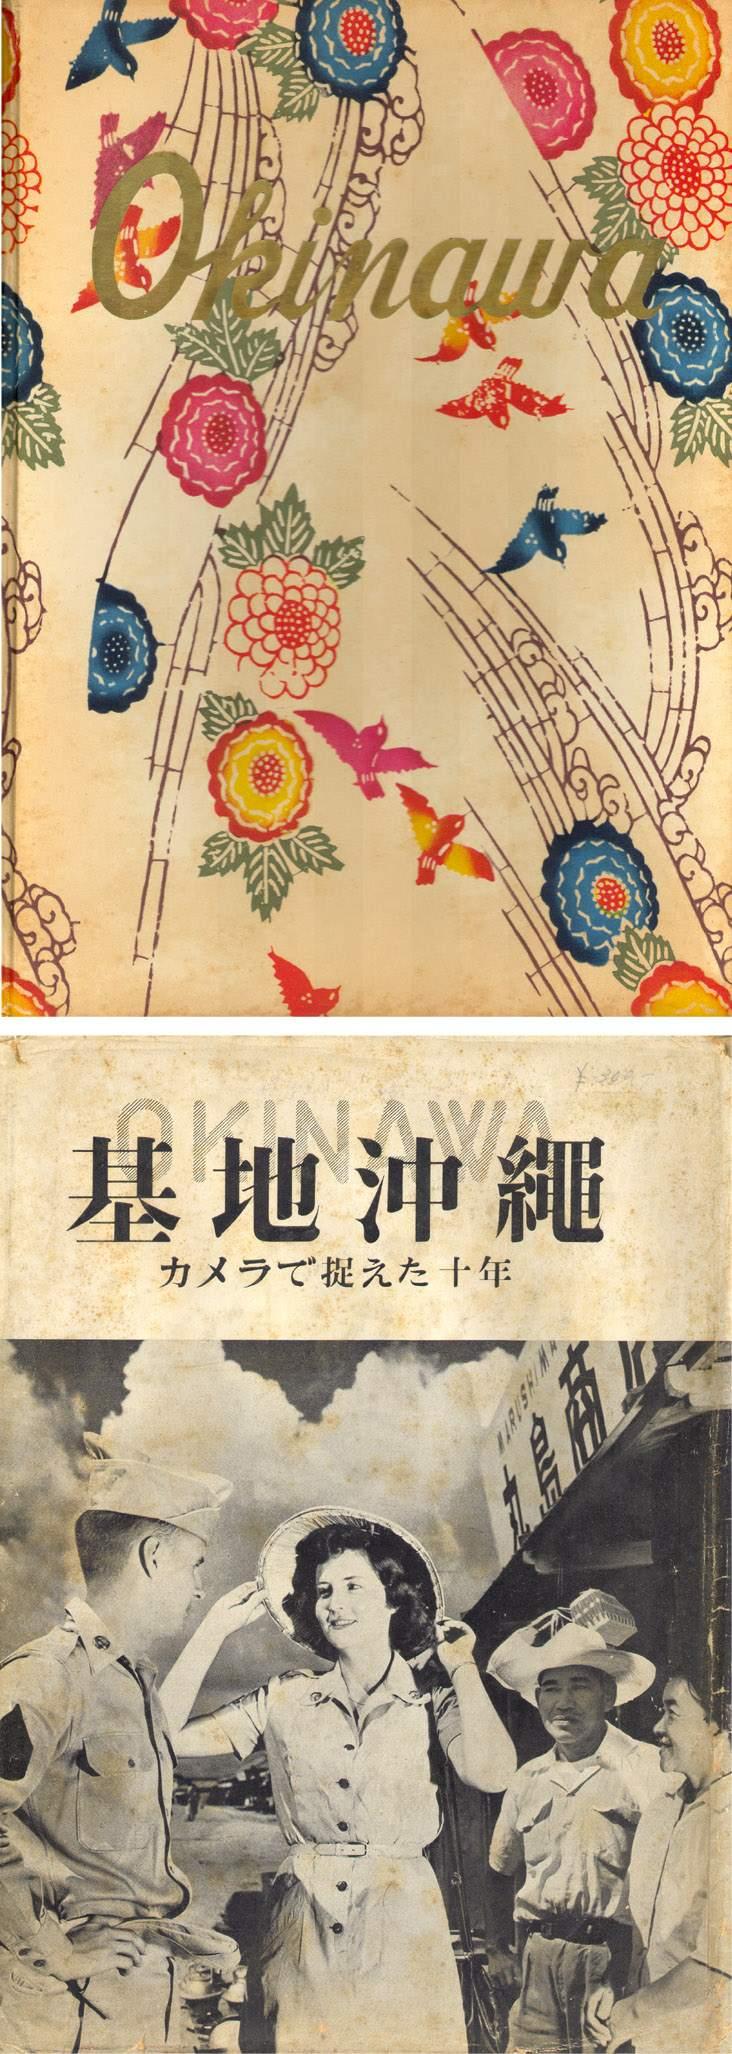 Okinawa Photo Essay Books By Blackie The Photographer